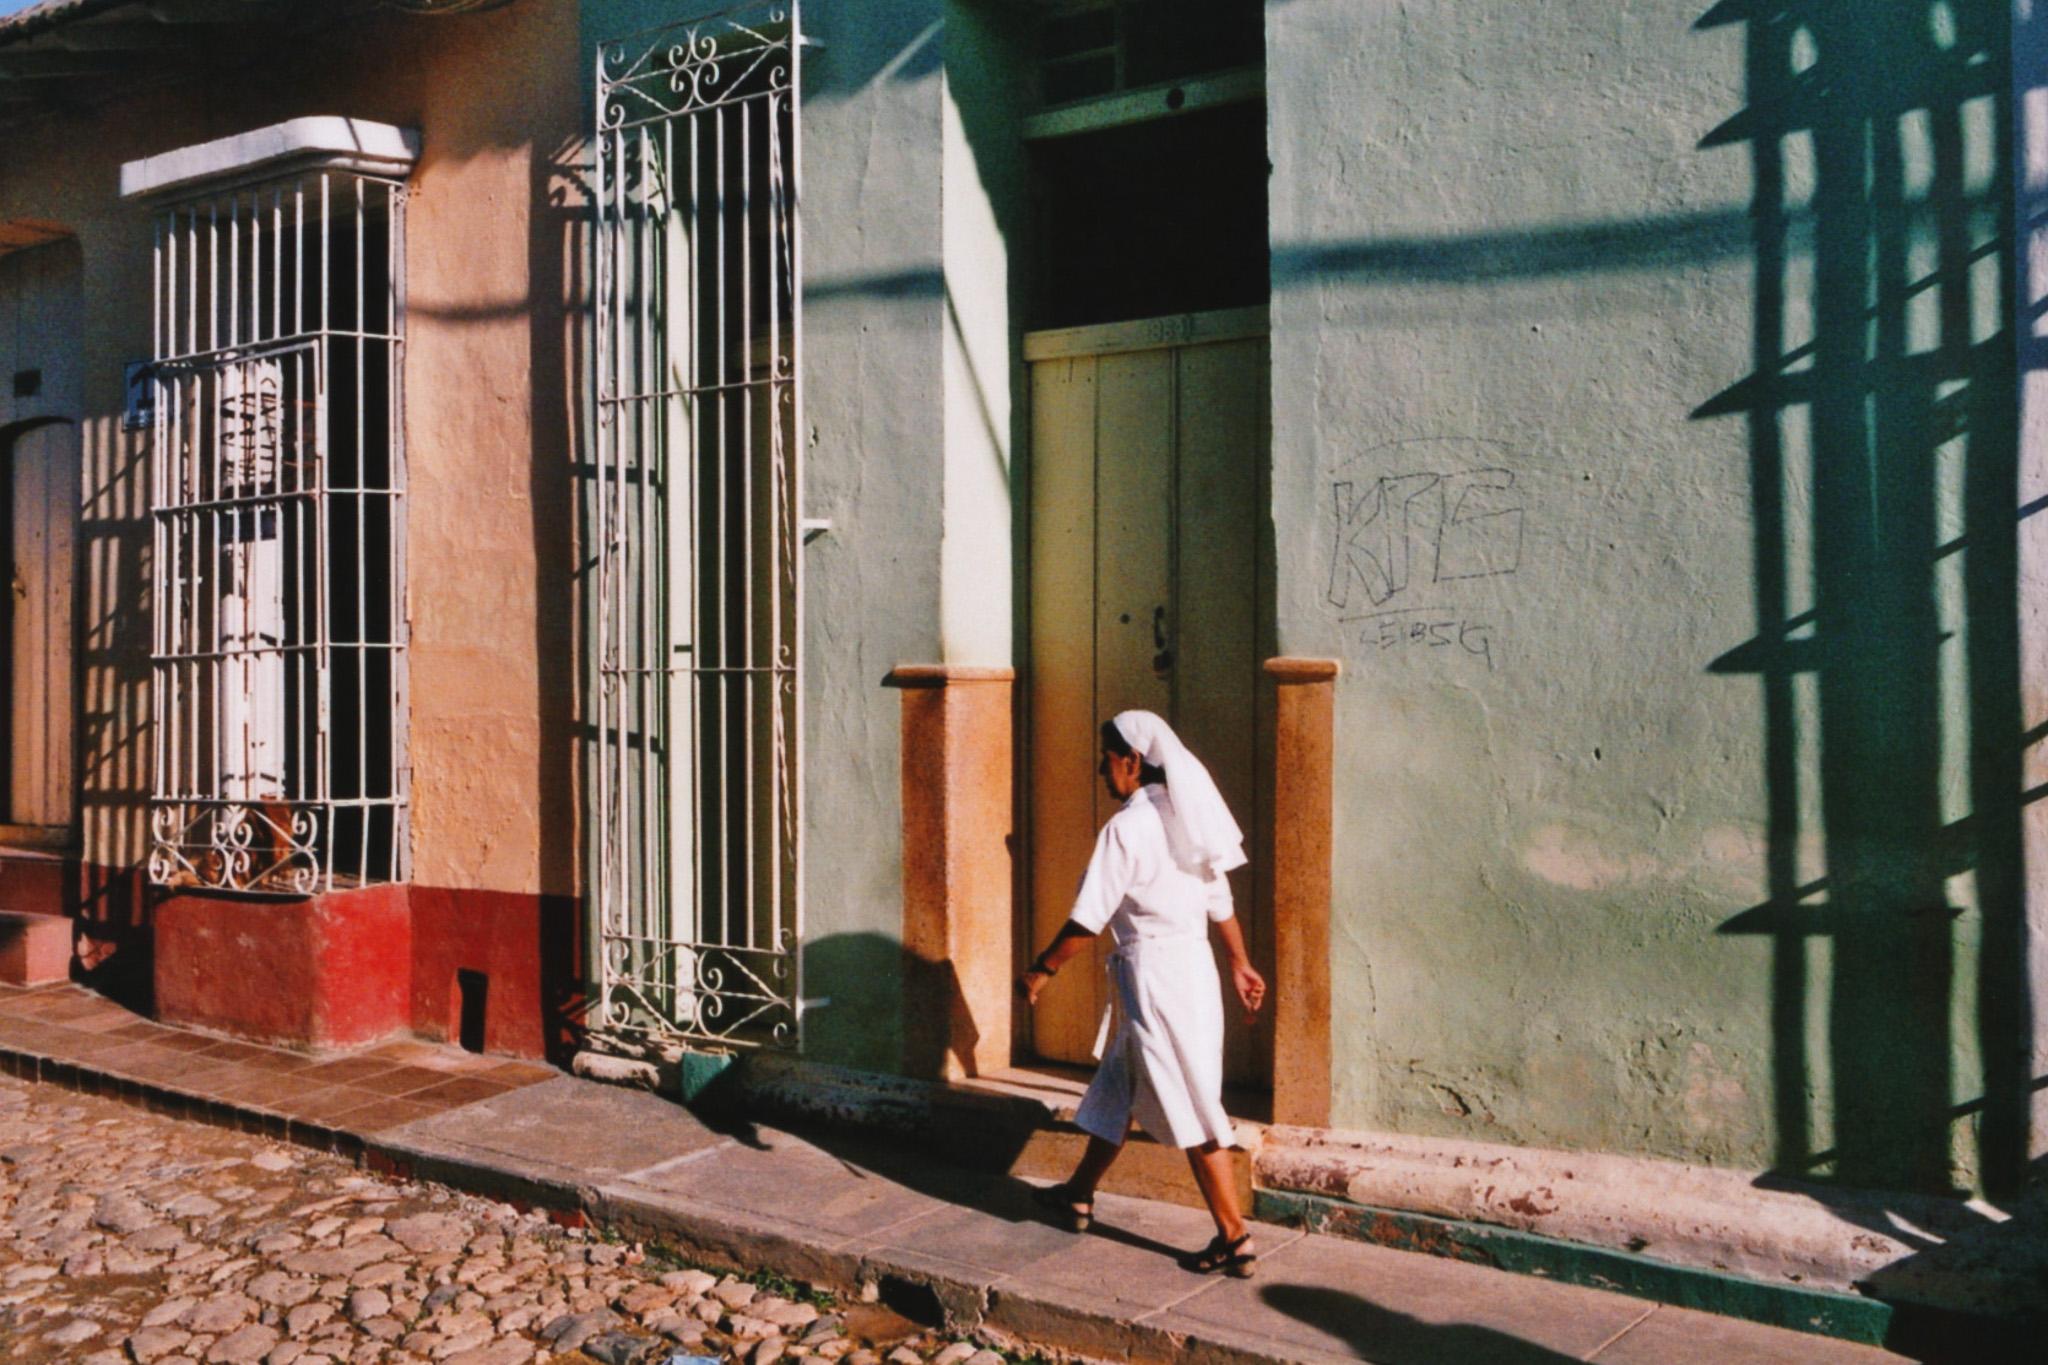 Kuba-2017-12-Analog-016.jpg